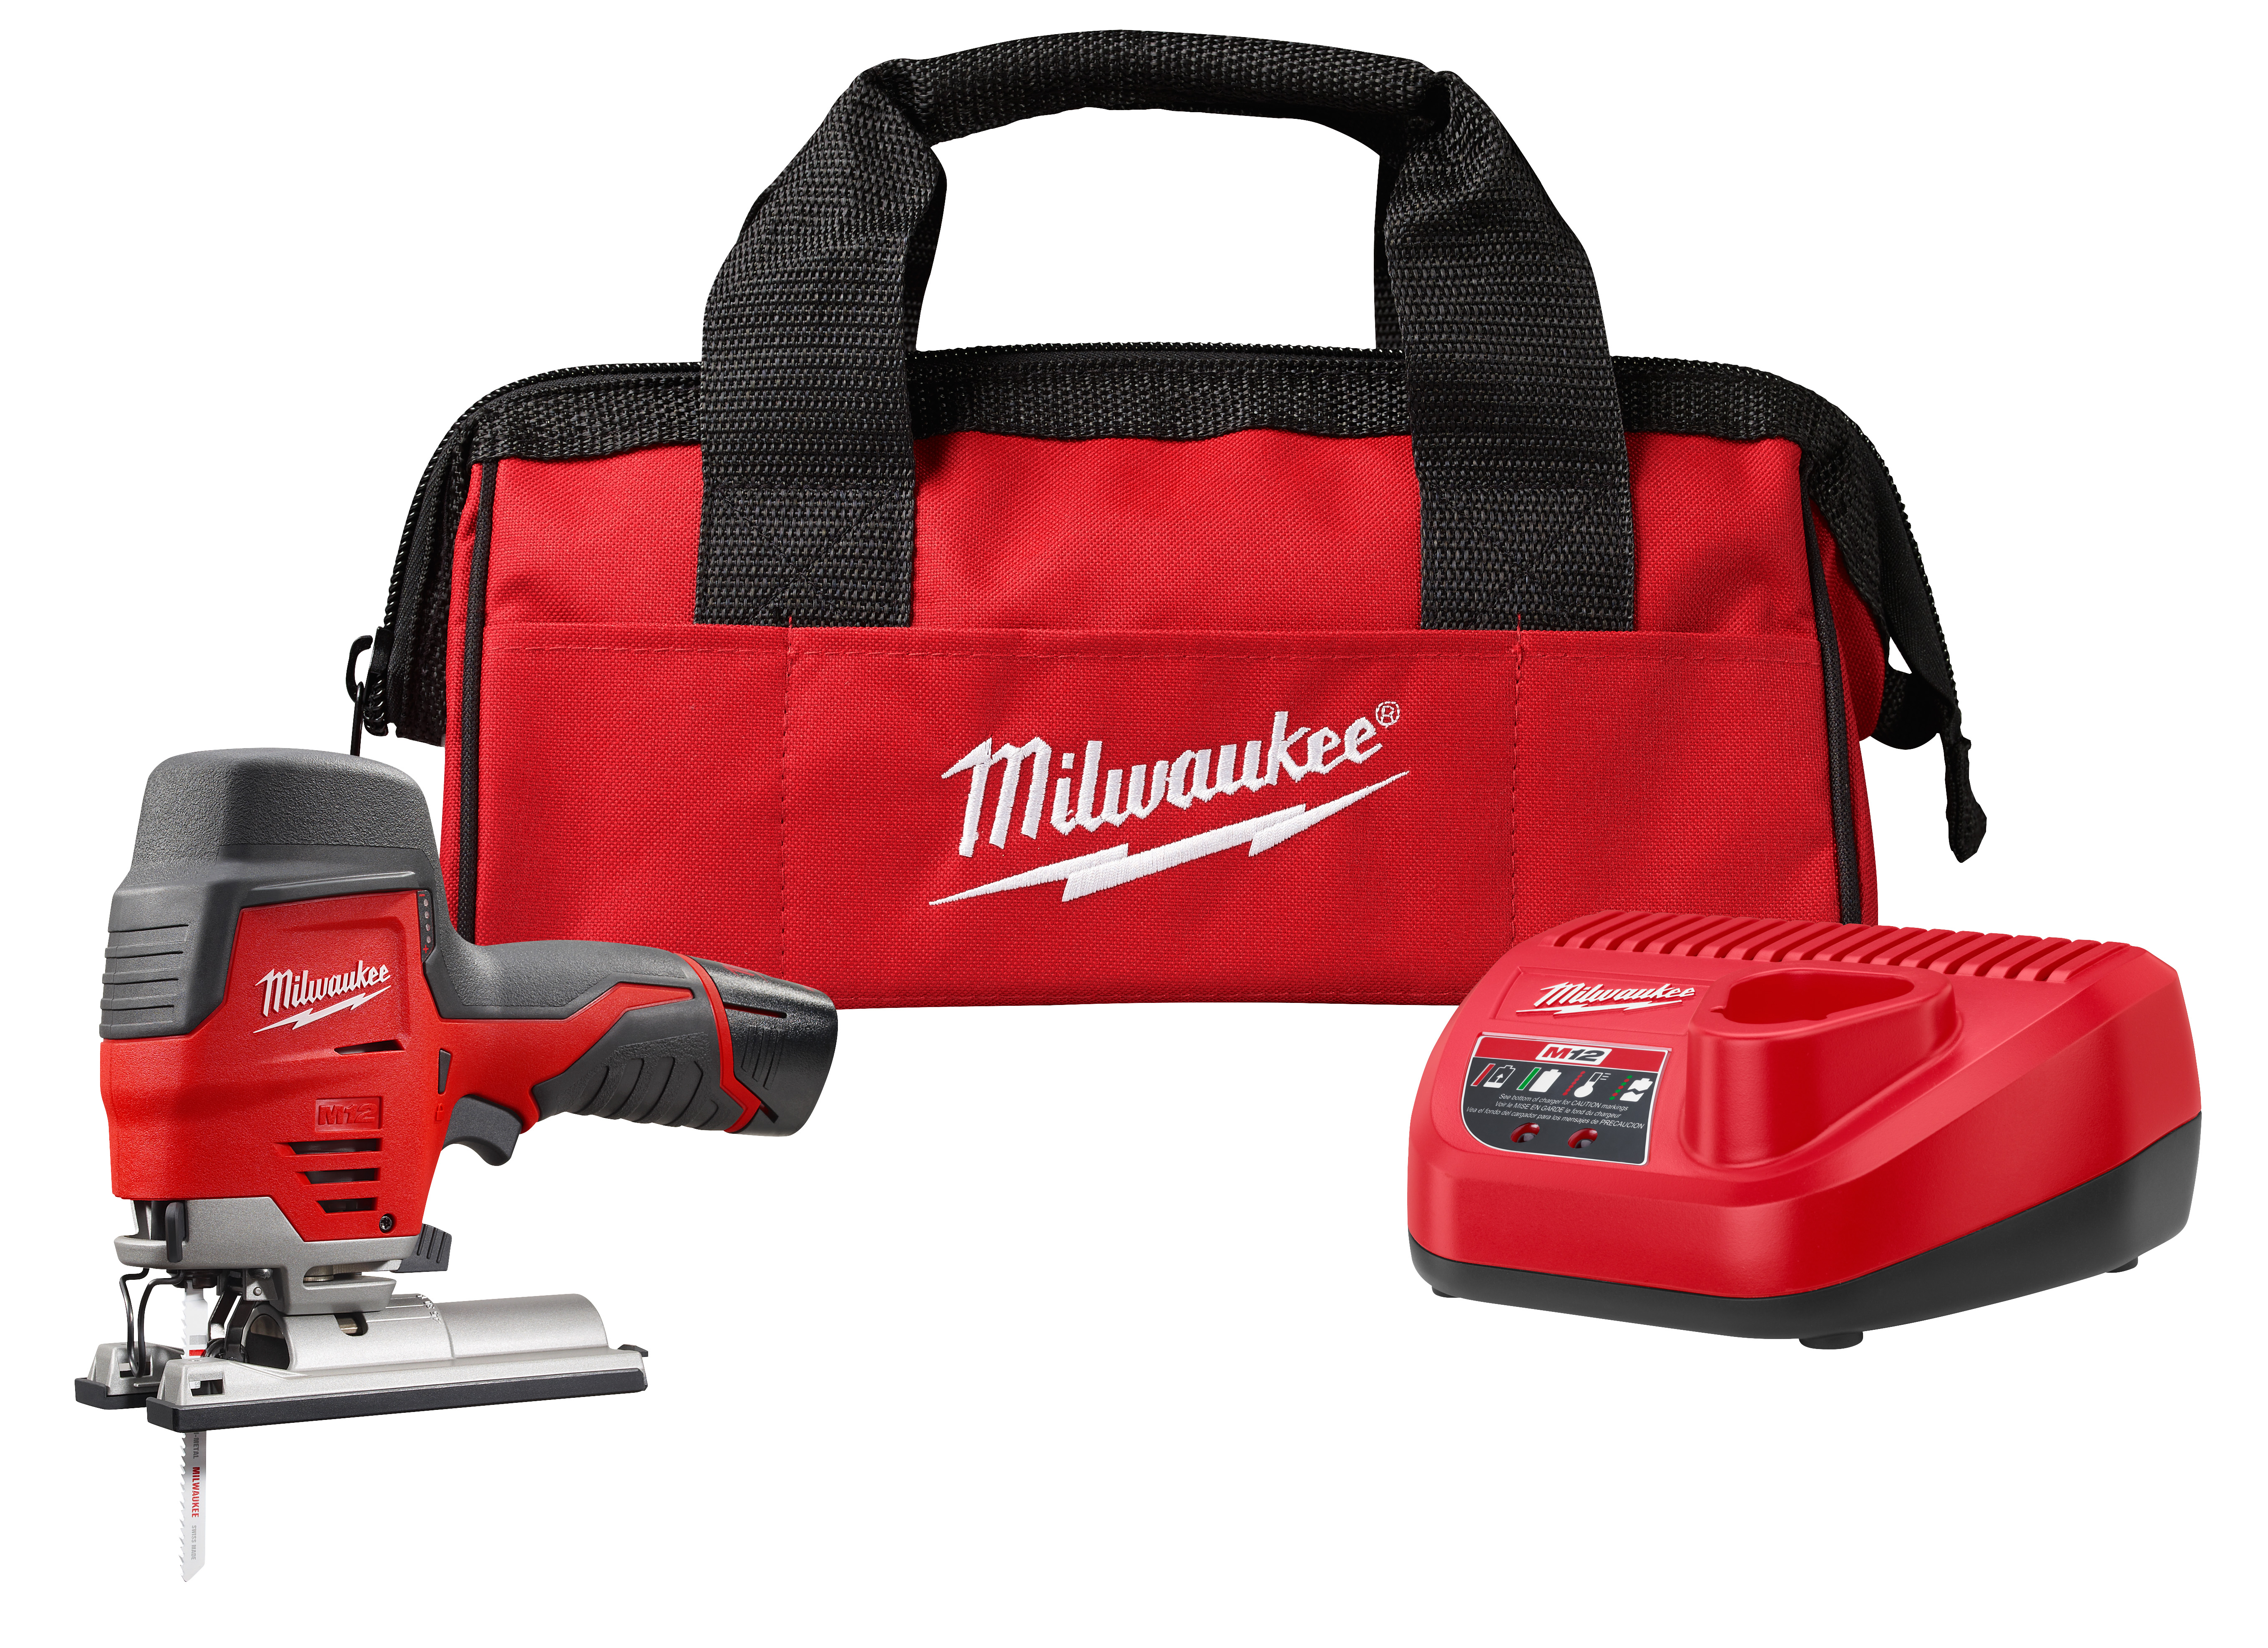 Milwaukee 2445-21 M12™ Cordless High Performance Jig Saw Kit